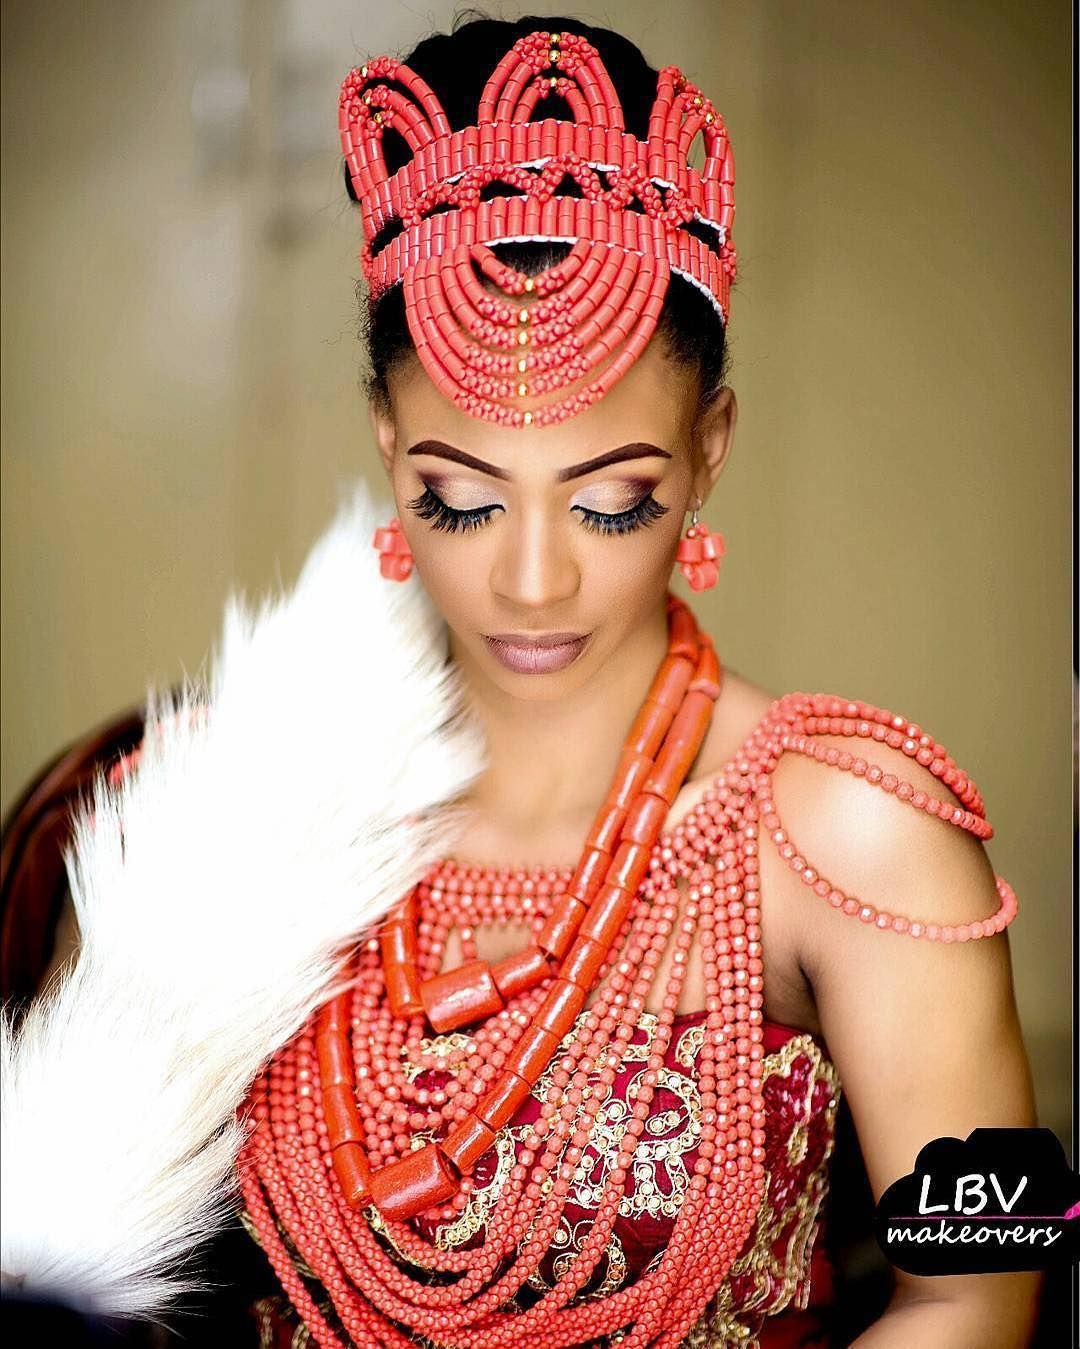 Igbo Nigerian Wedding: Pin By The Urban Turbanista On Turbanista Swag